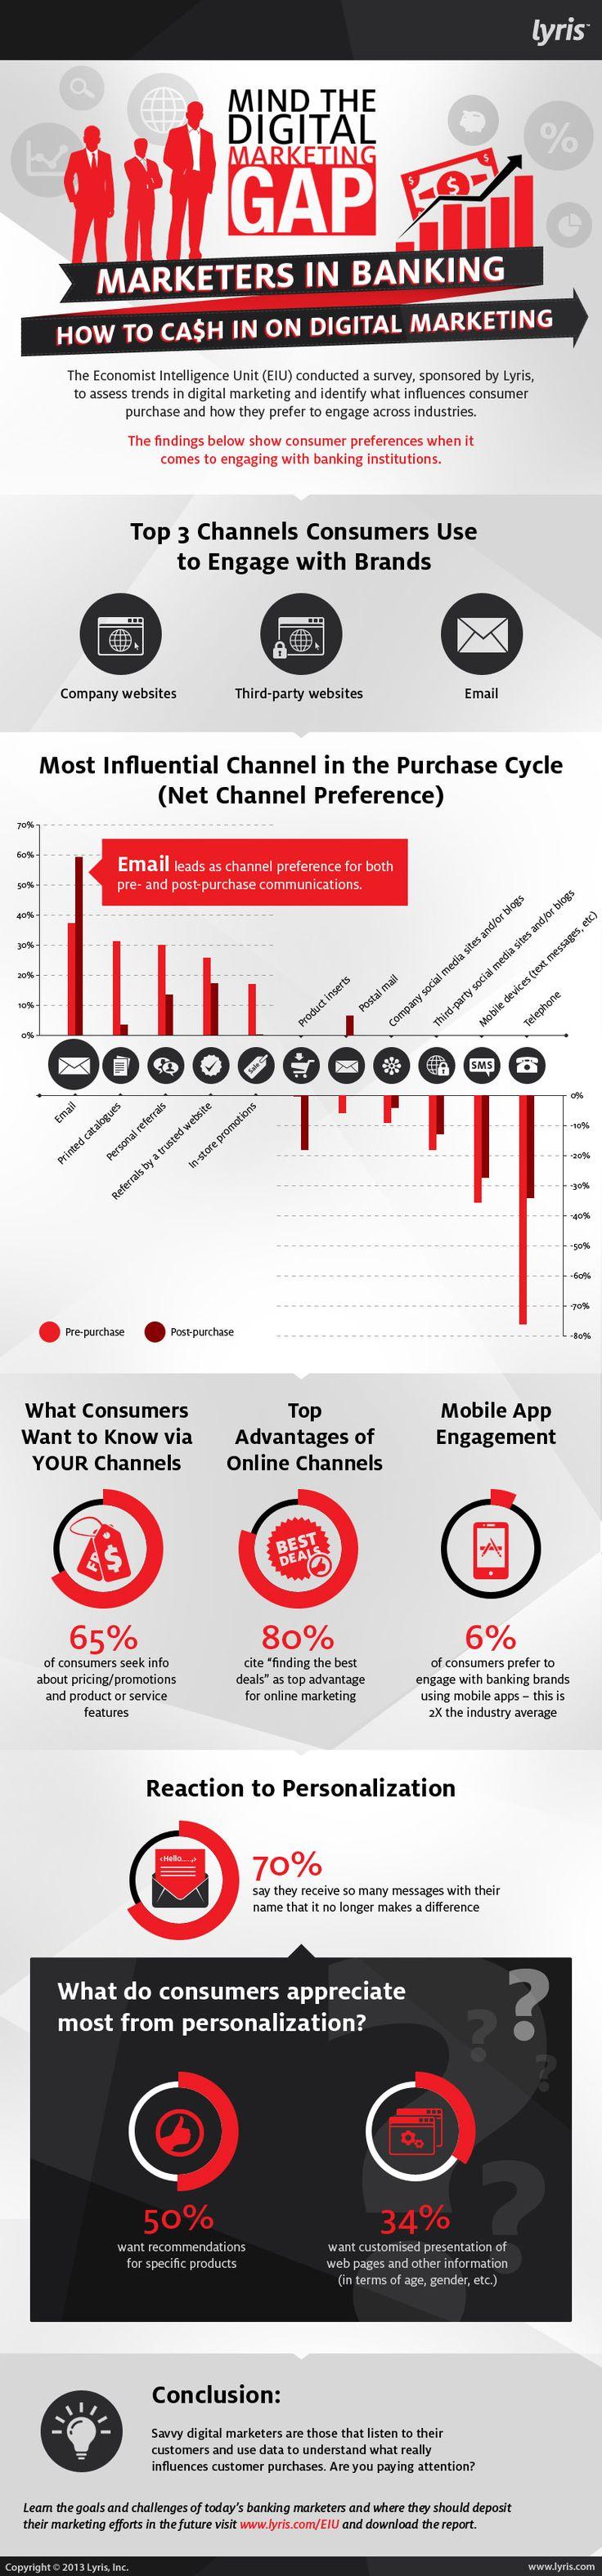 Mind the Digital Marketing Gap: The Economist Intelligence Unit Banking Survey Findings